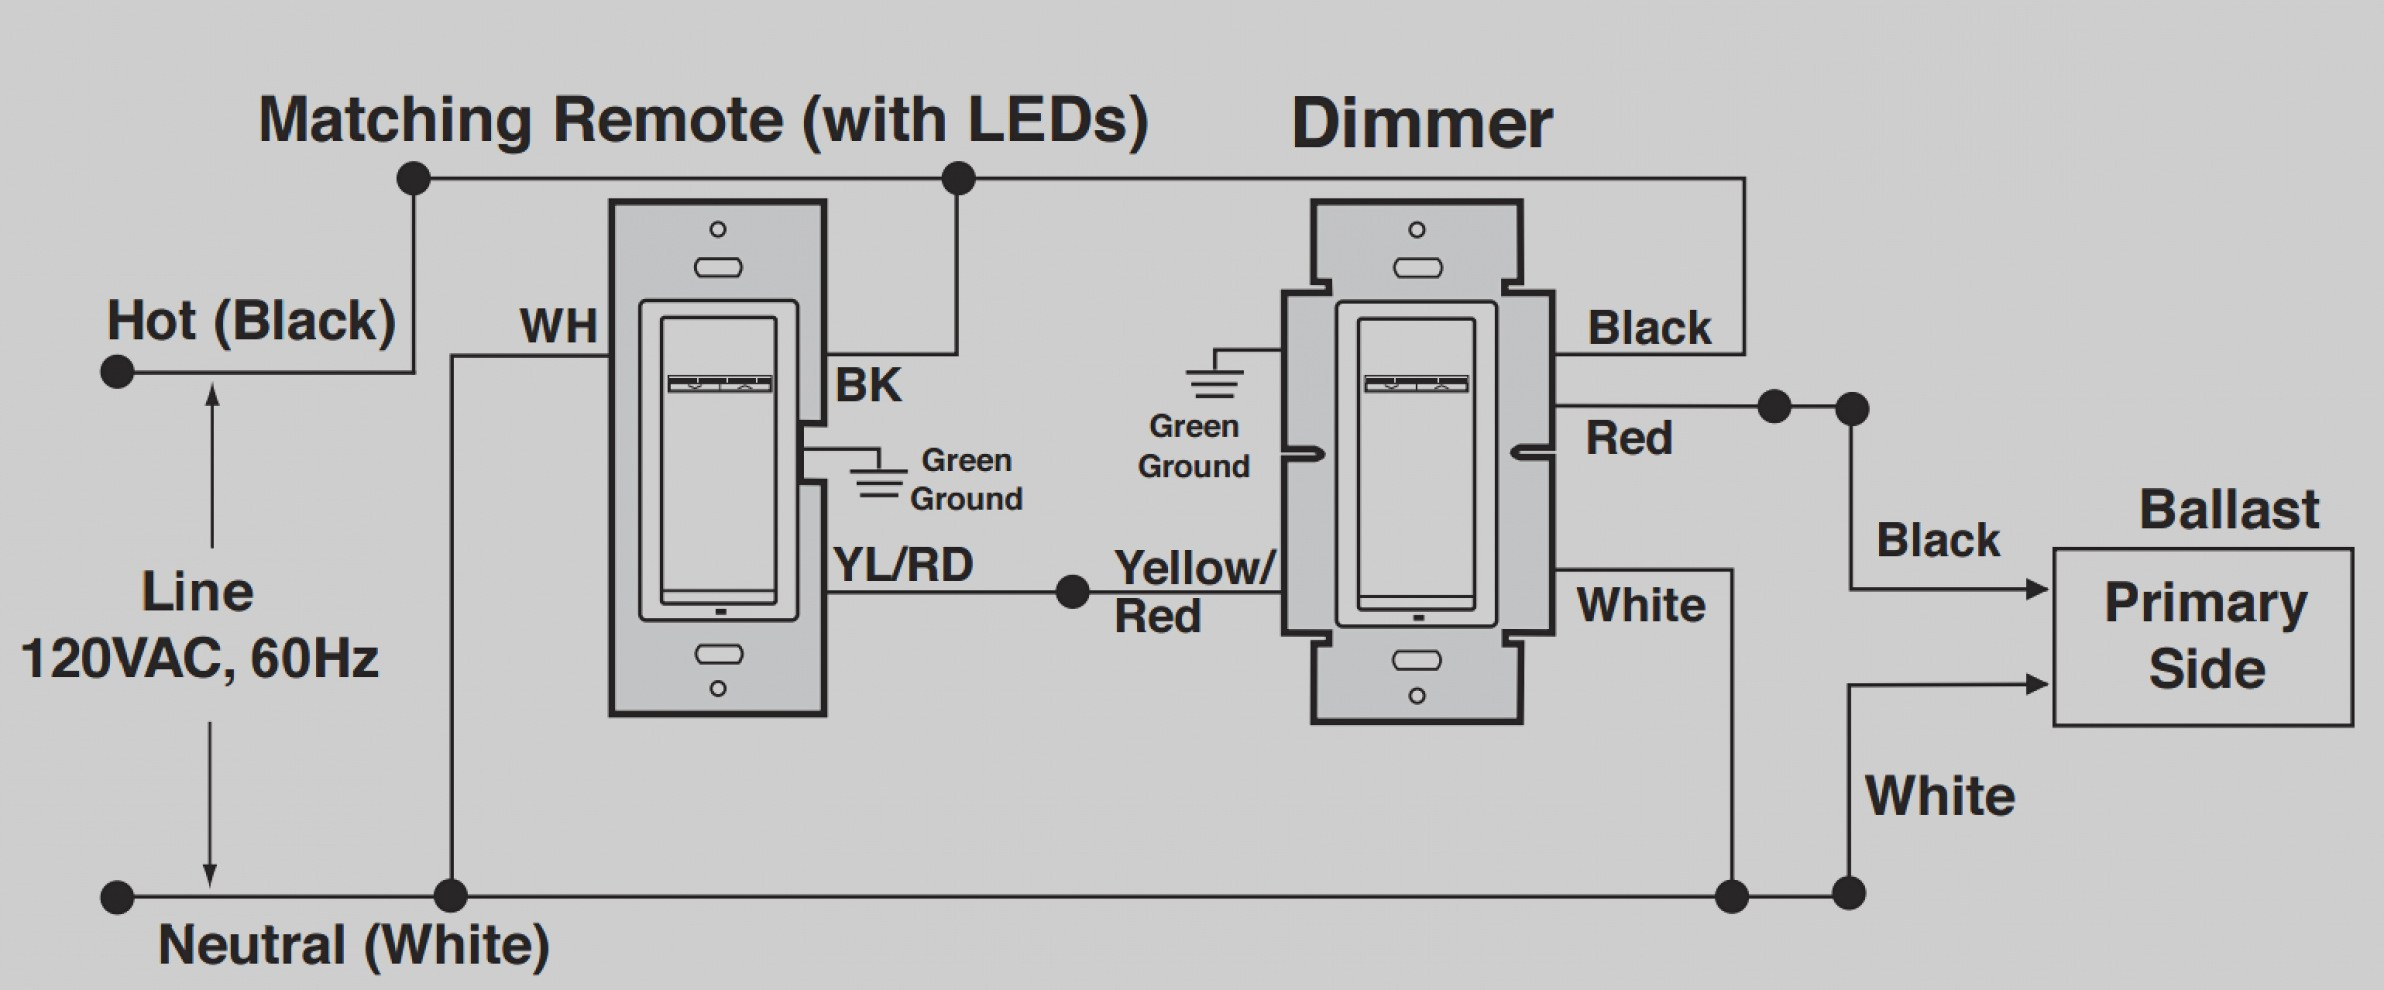 10Vdc Wiring Diagram | Wiring Diagram - Dimmer Switch Wiring Diagram